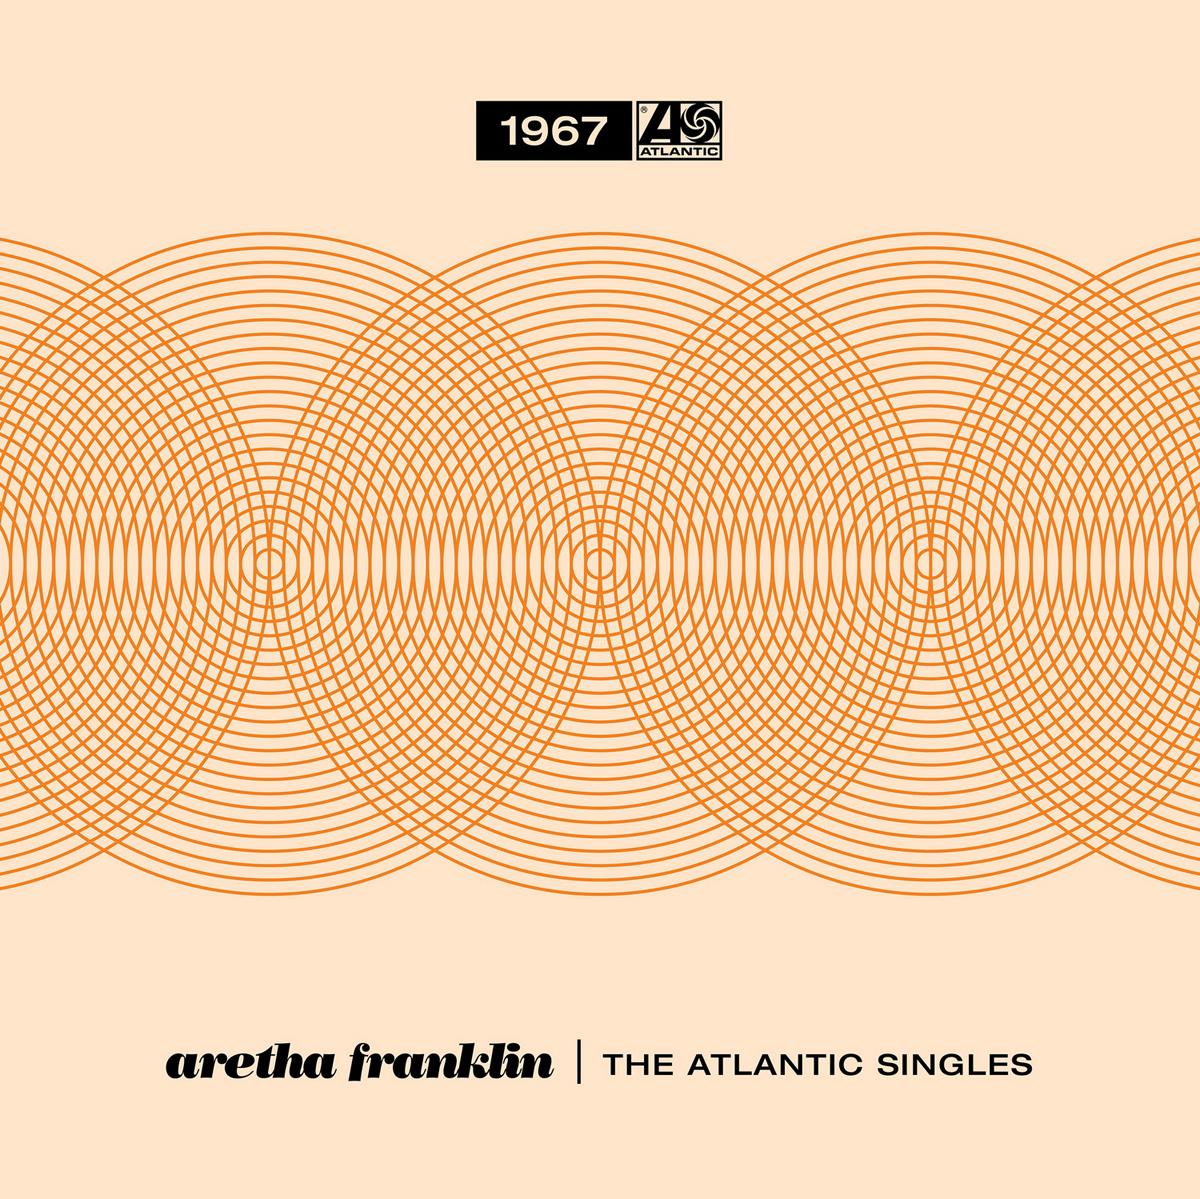 Арета Фрэнклин Aretha Franklin. The Atlantic Singles Collection 1967 (5 LP) арета фрэнклин aretha franklin amazing grace 2 lp